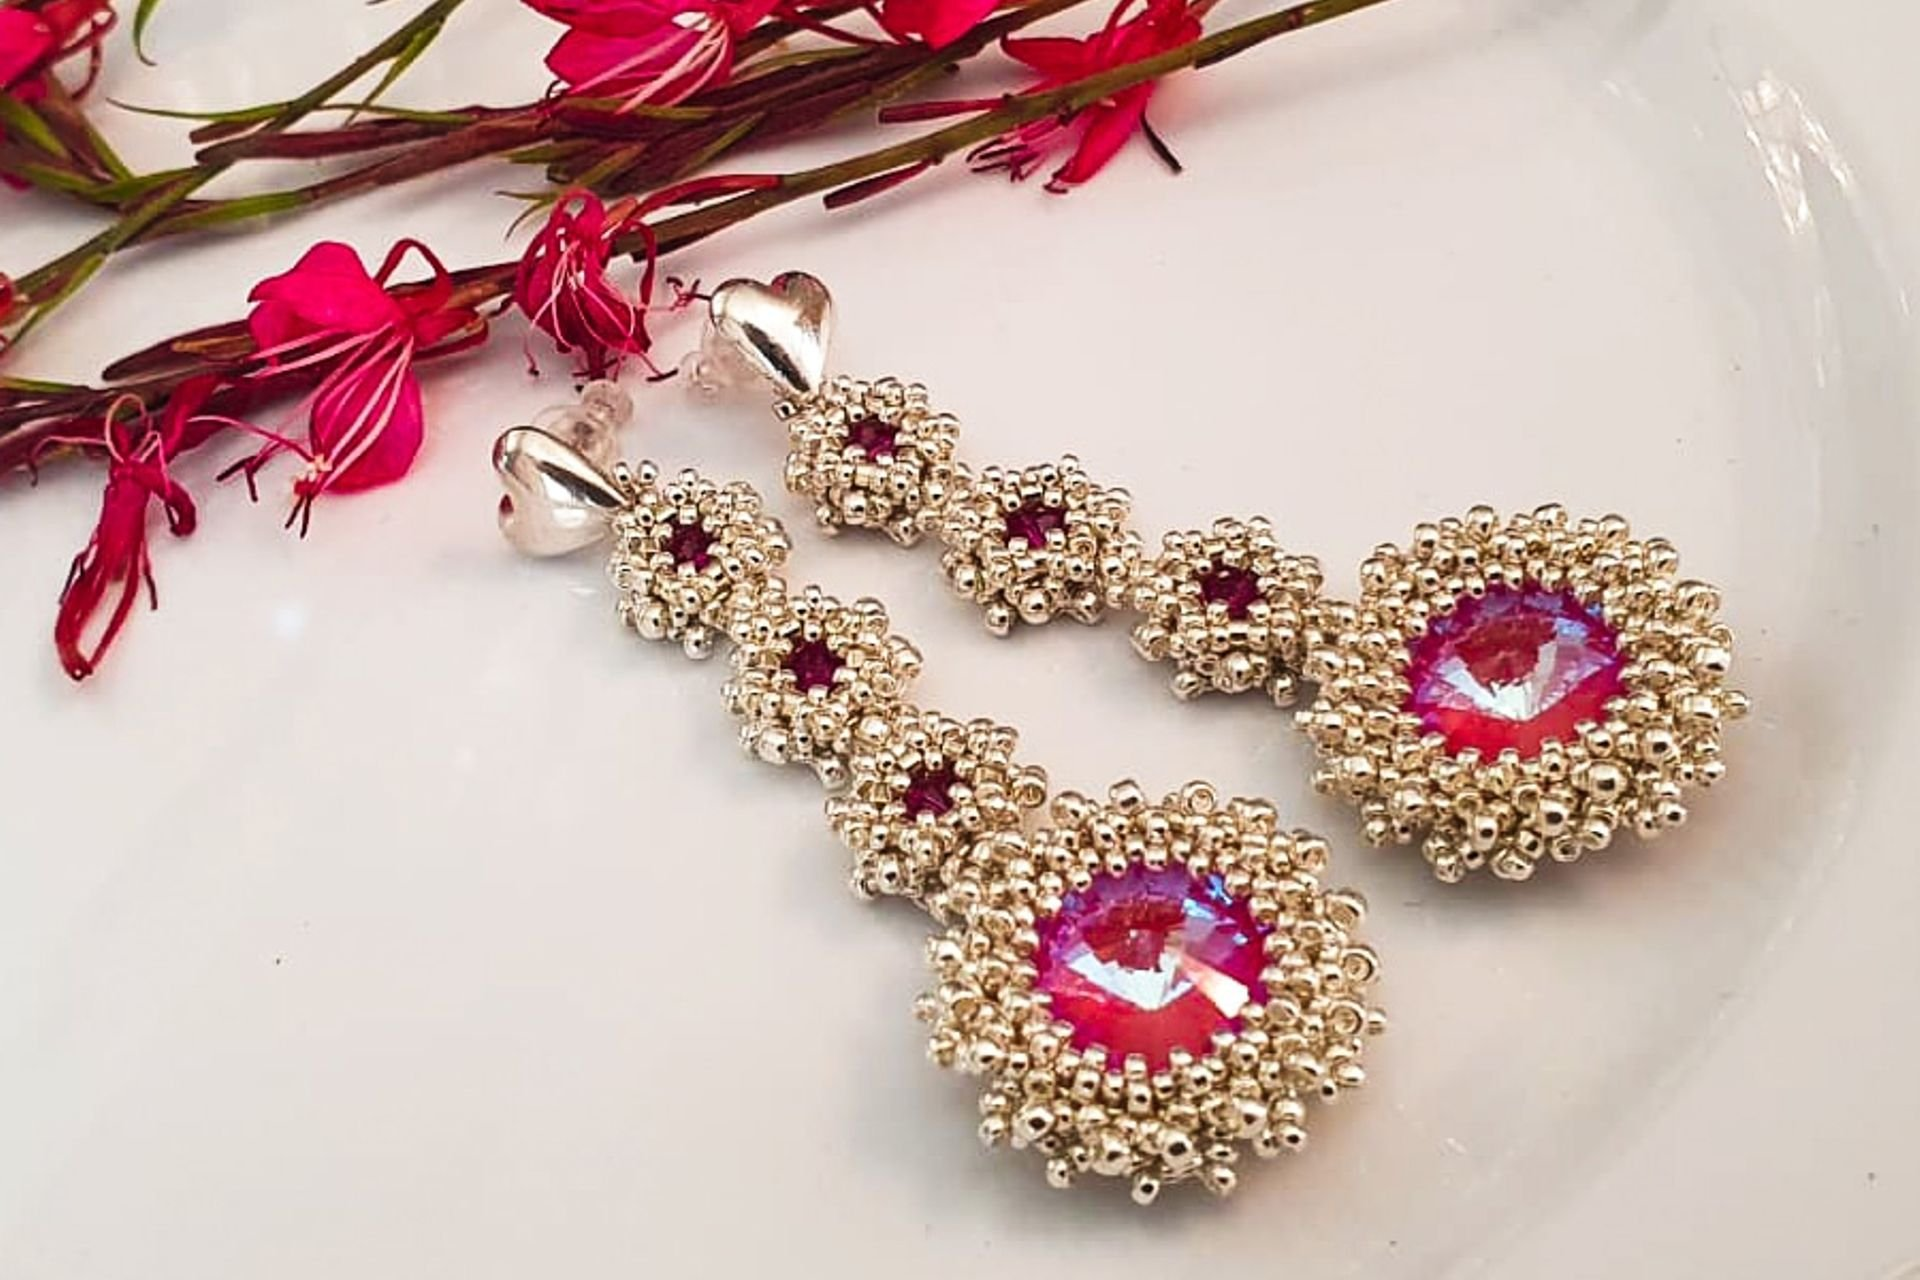 2 lantana beads jewelry designer תְמוּנָה